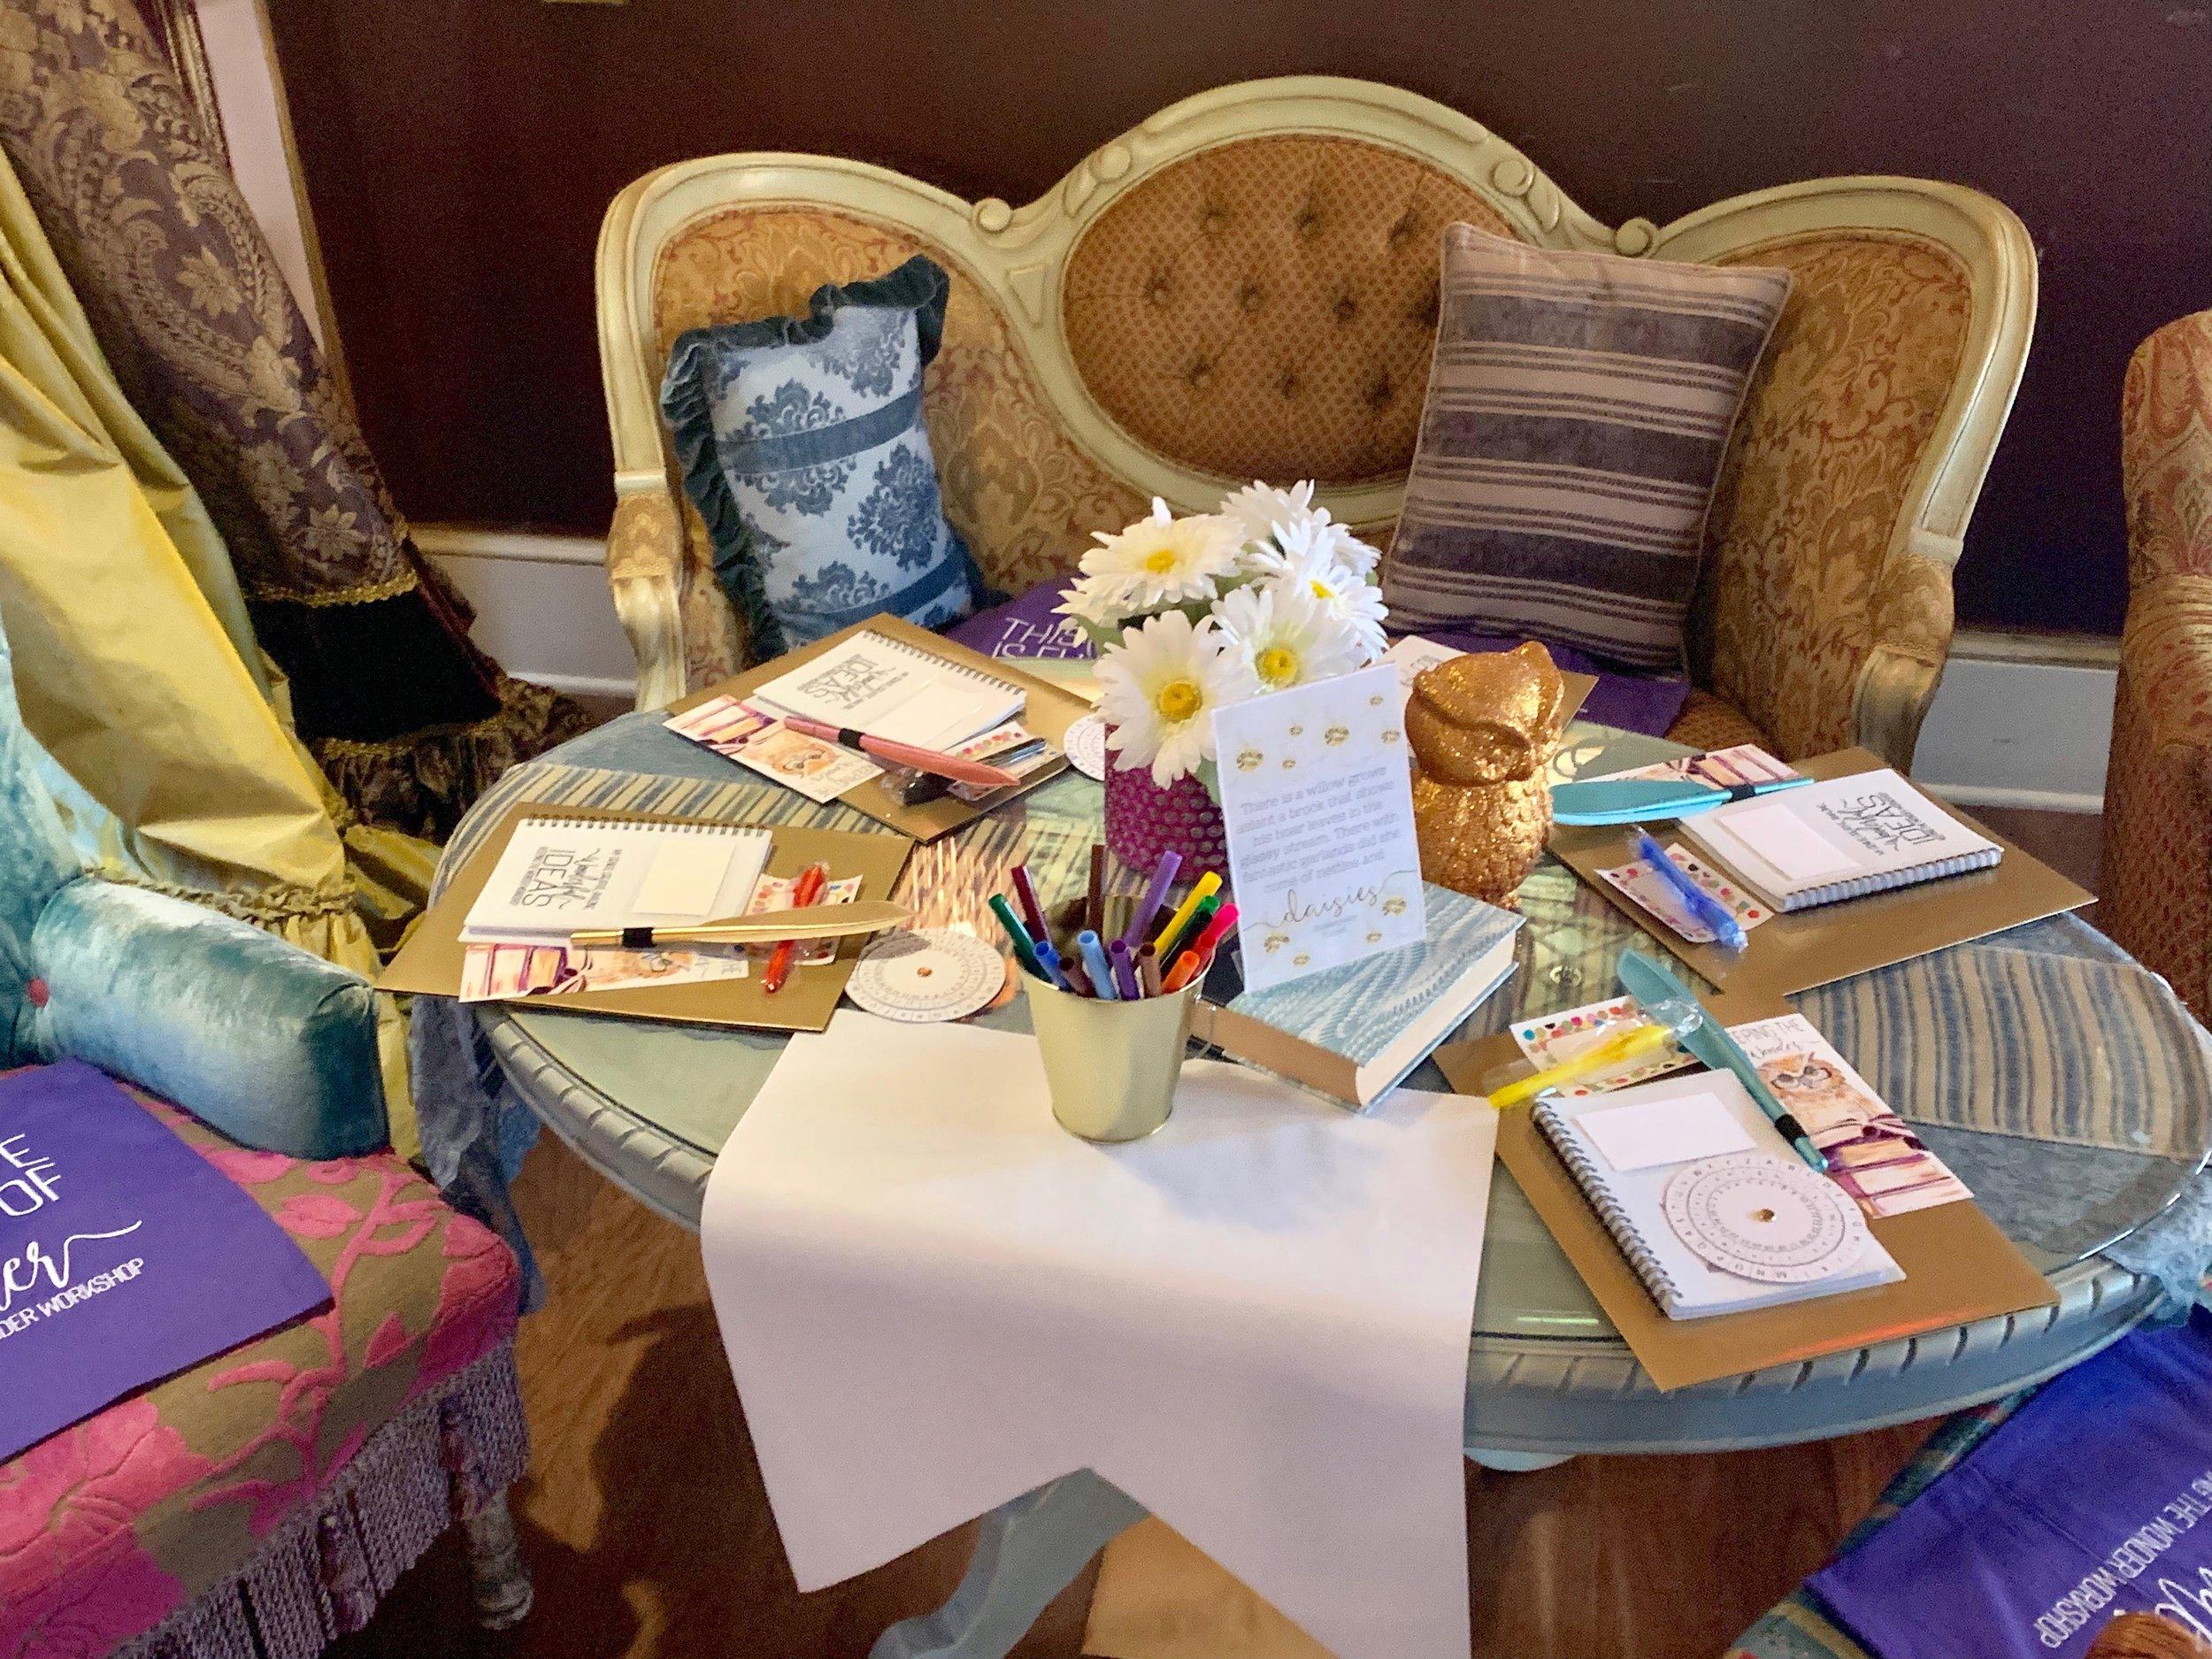 Workshop seating setup for guests. Photo Credit: Angelyne Collins